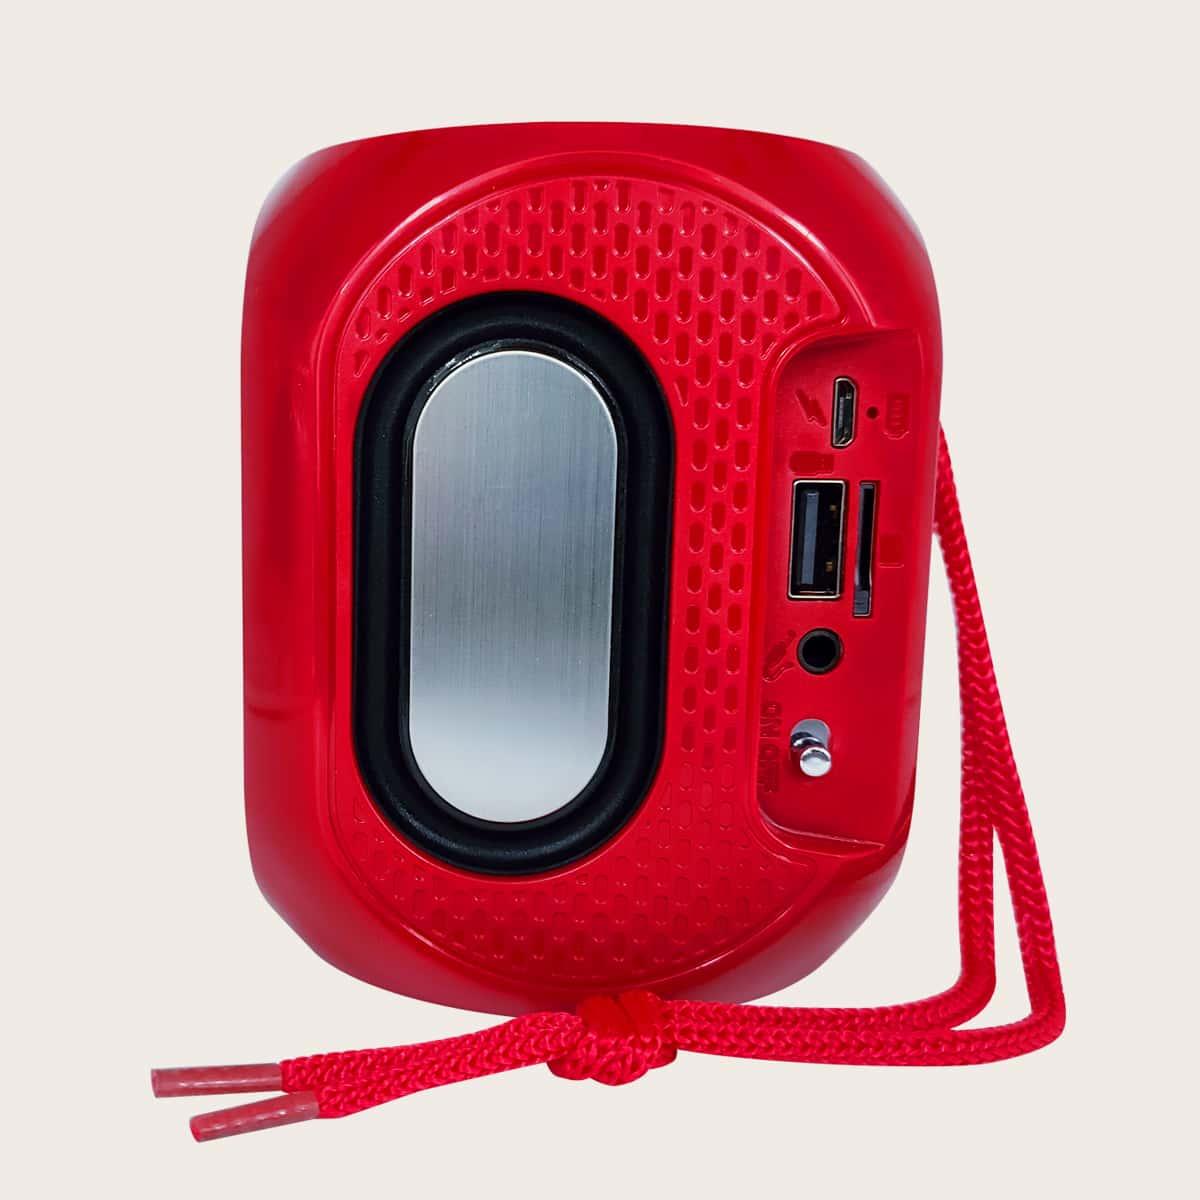 Tragbarer drahtloser Bluetooth-Lautsprecher